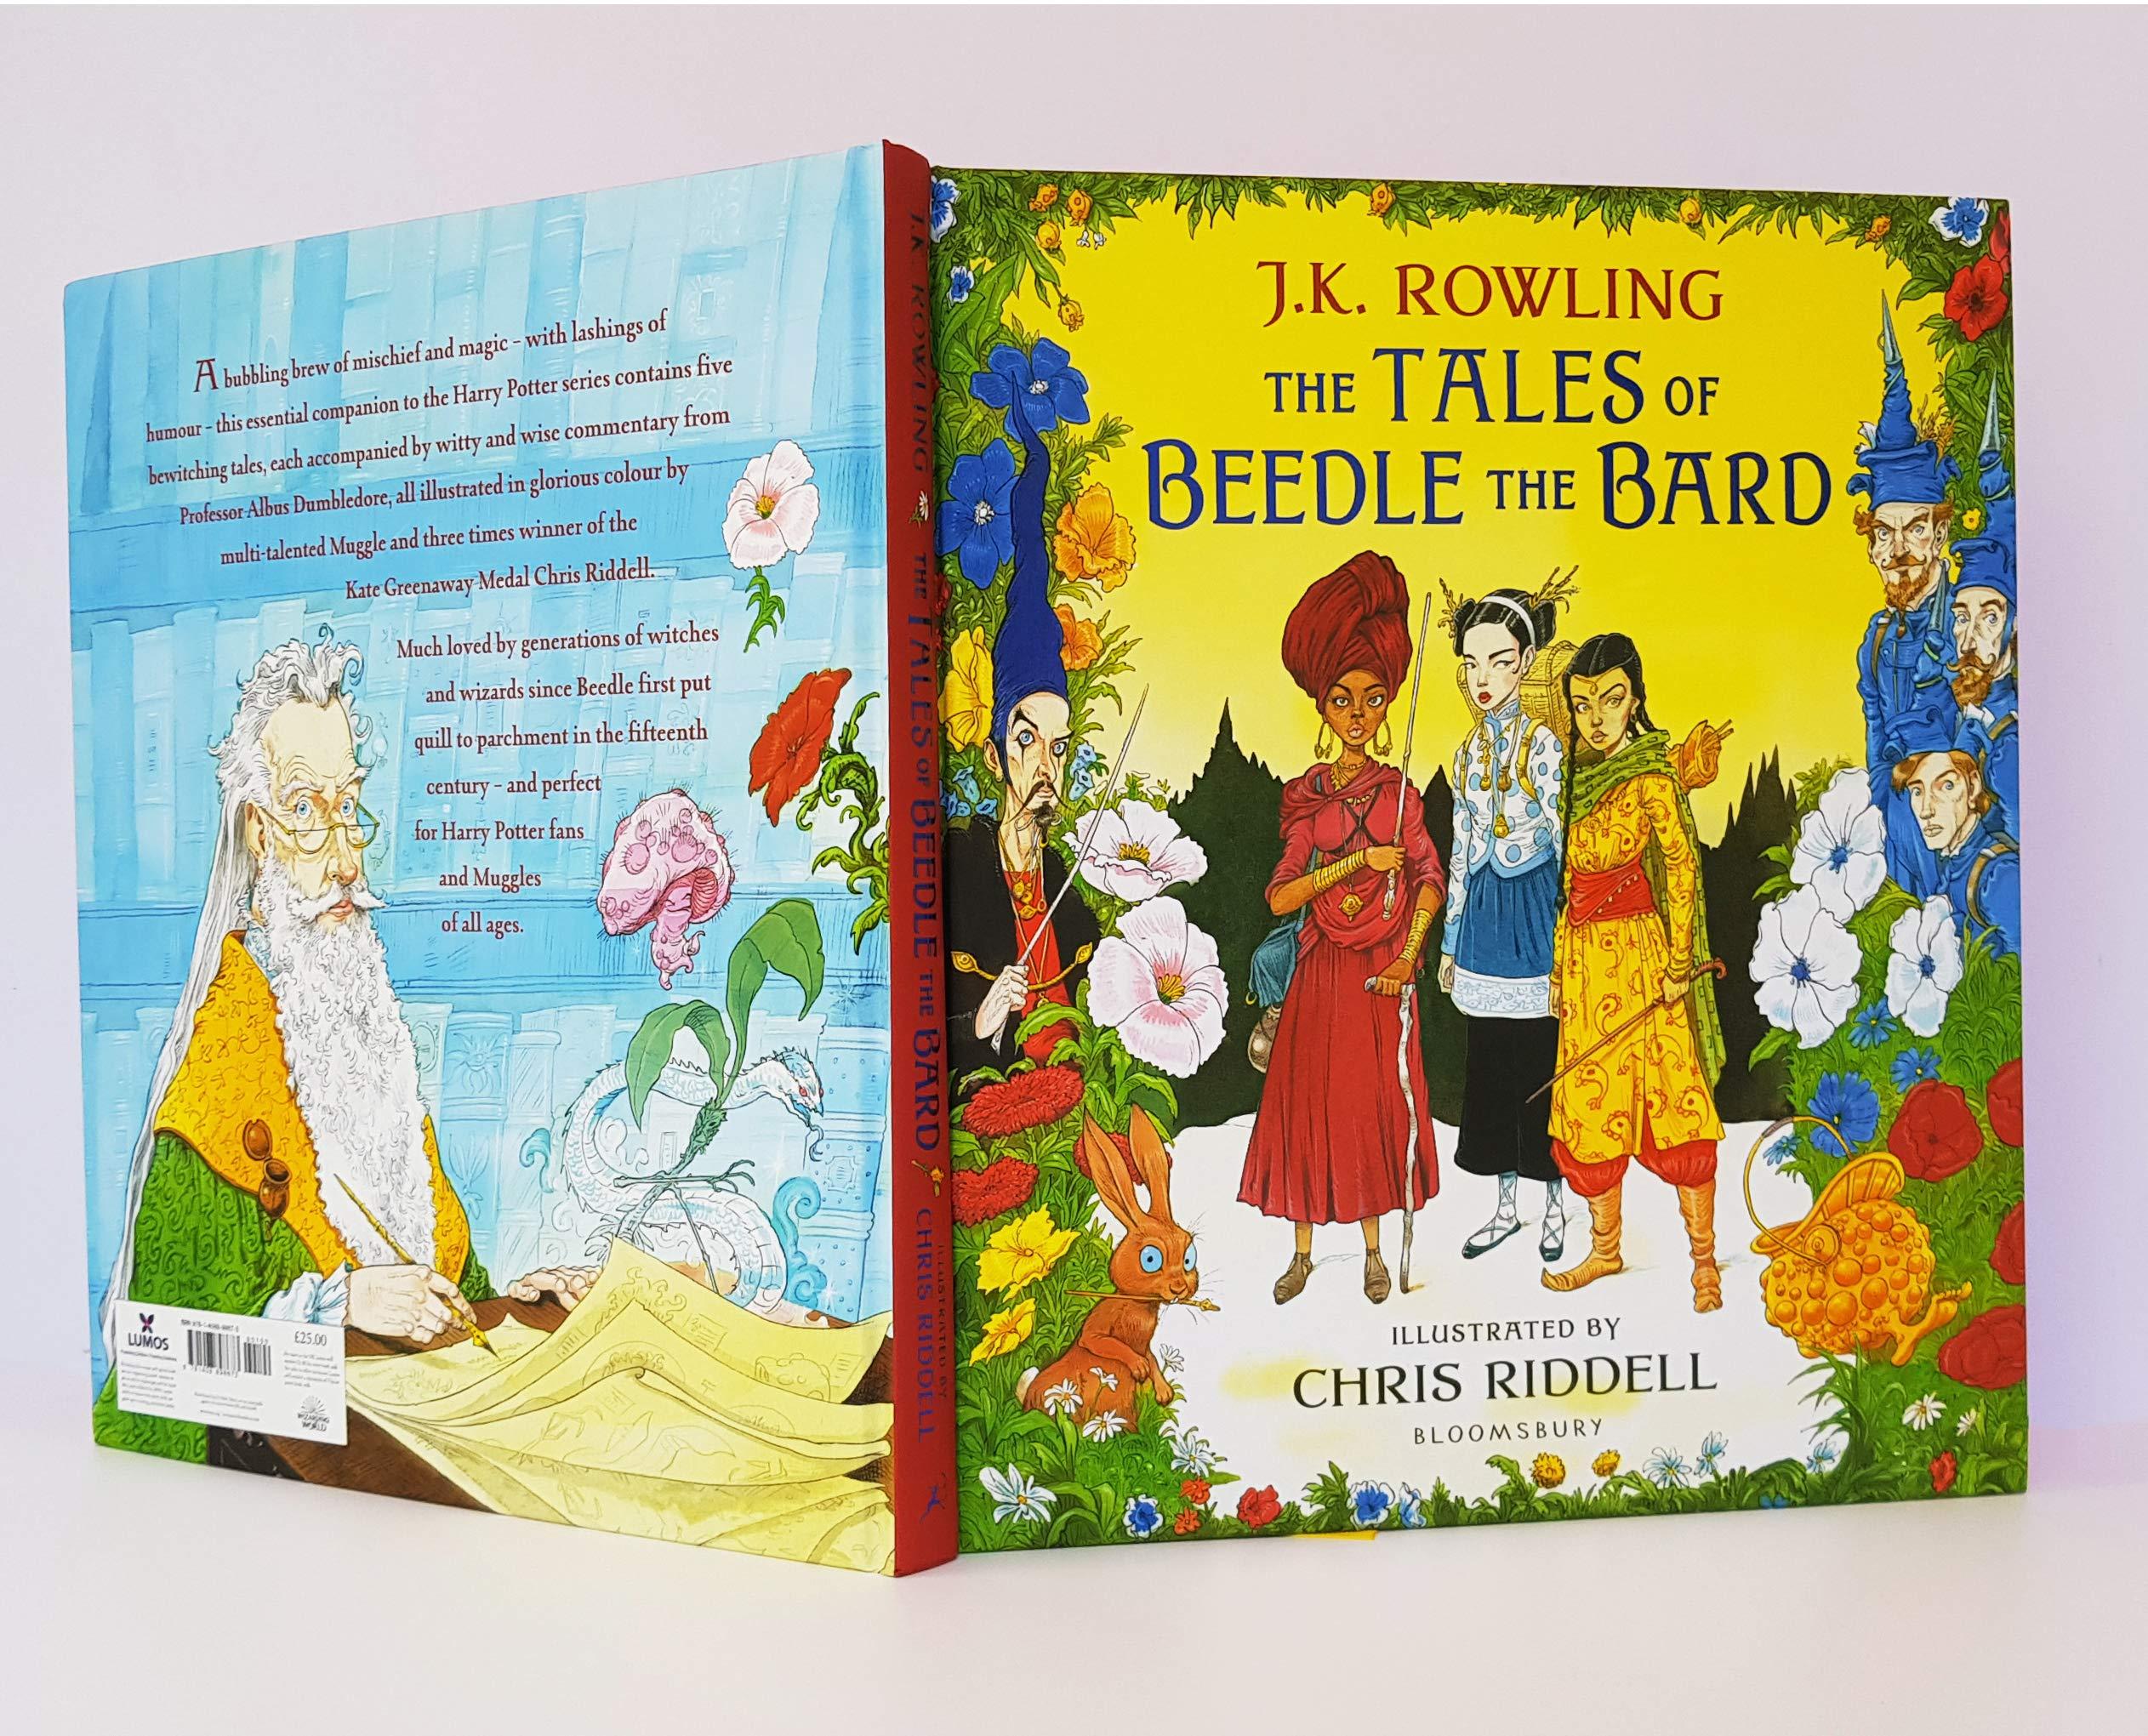 The tales of beedle the bard ebook door j. K. Rowling.